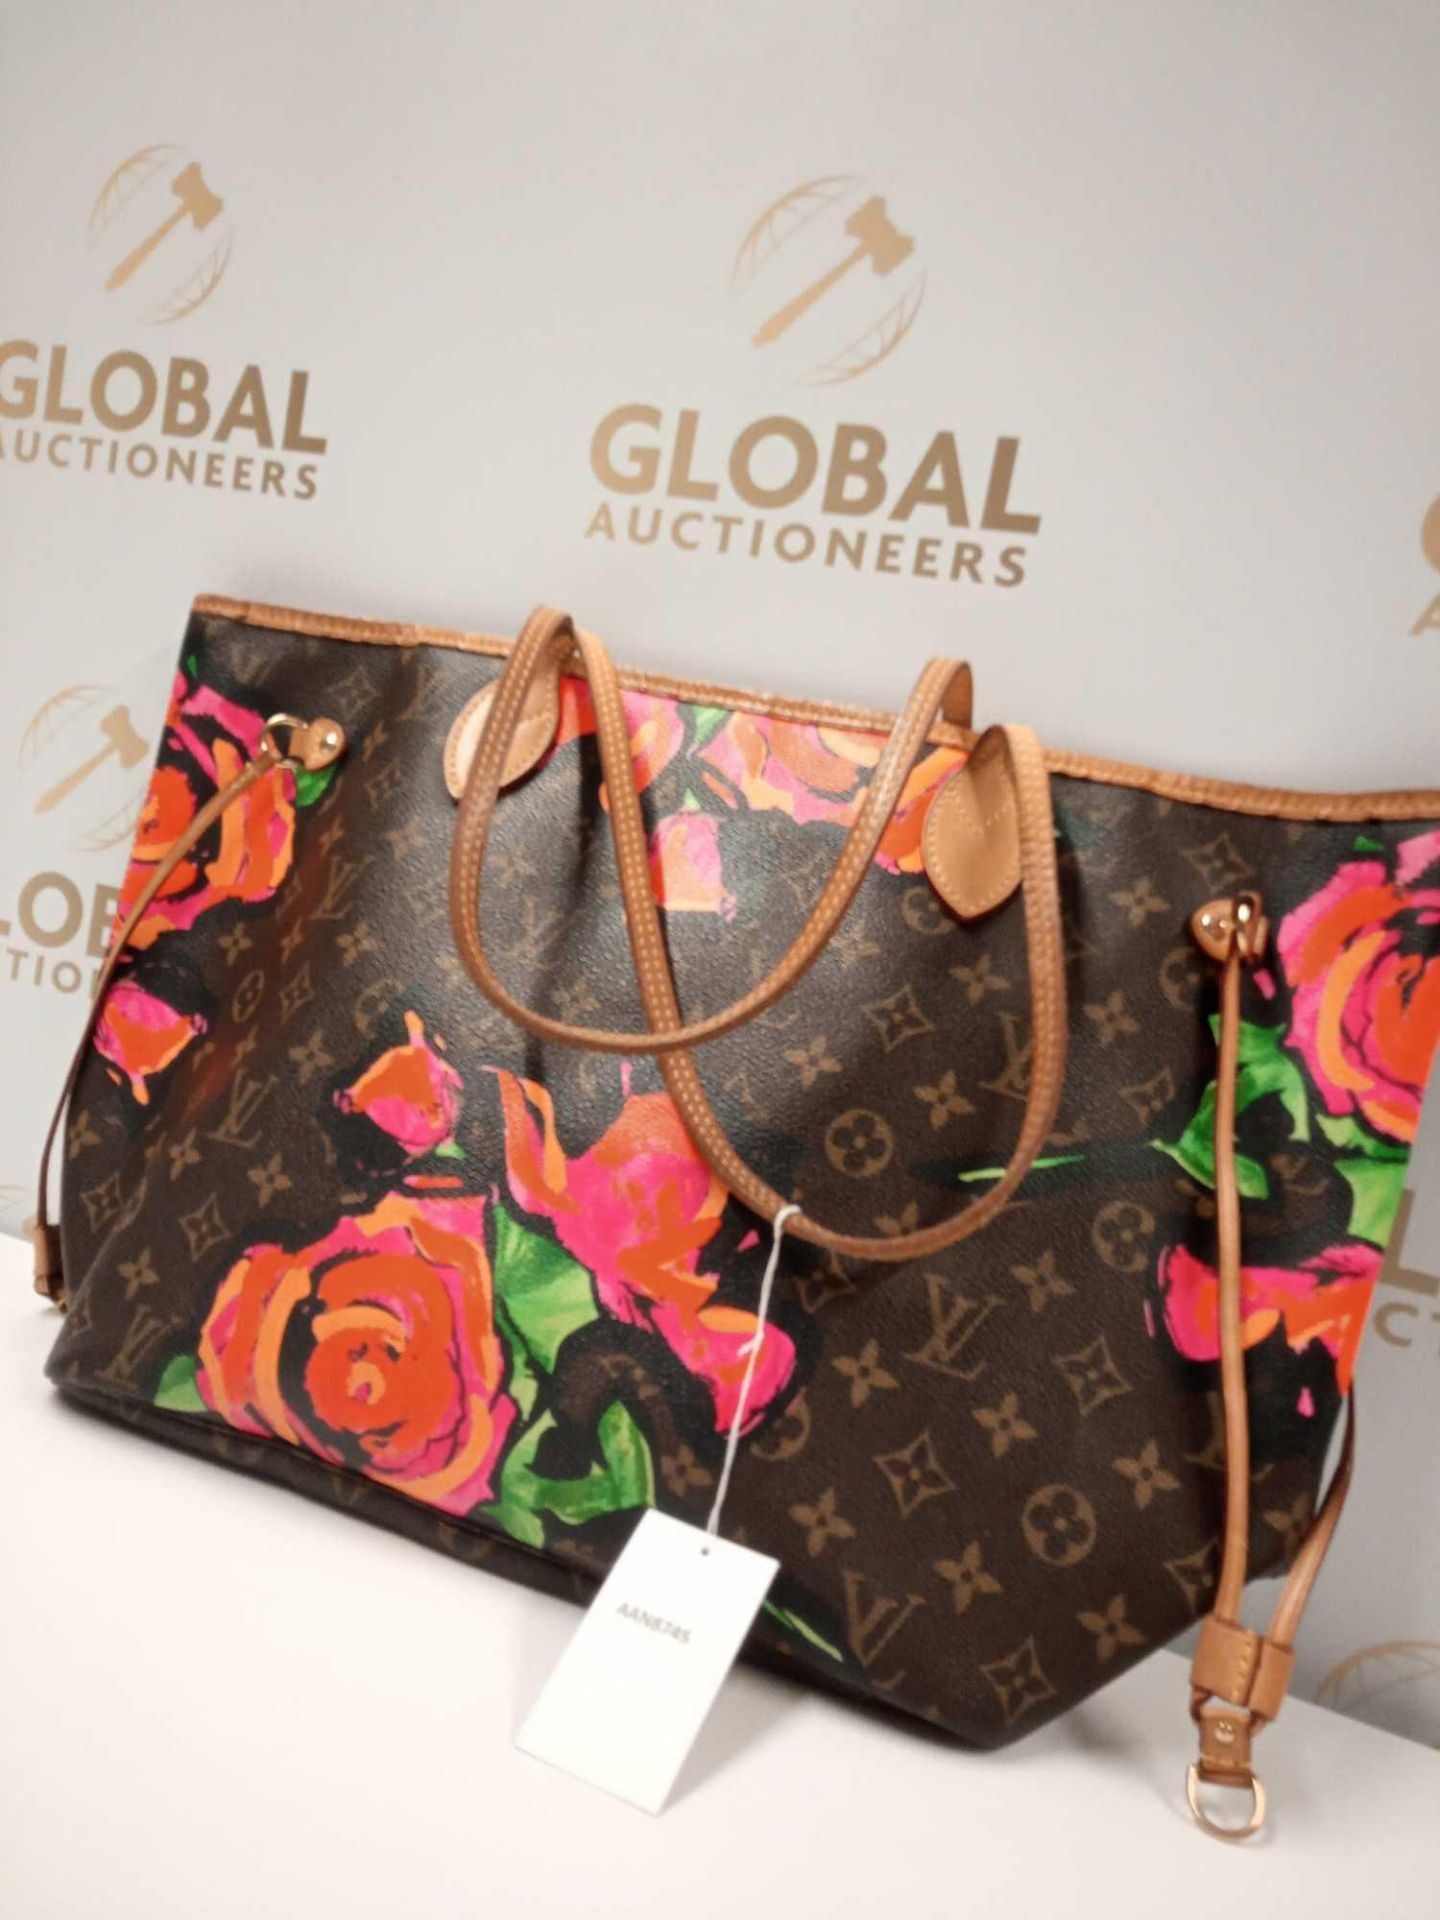 RRP £3000 Louis Vuitton Limited Edition Monogram Roses Shoulder Bag Aan8745, Grade Ab (Appraisals - Image 2 of 4